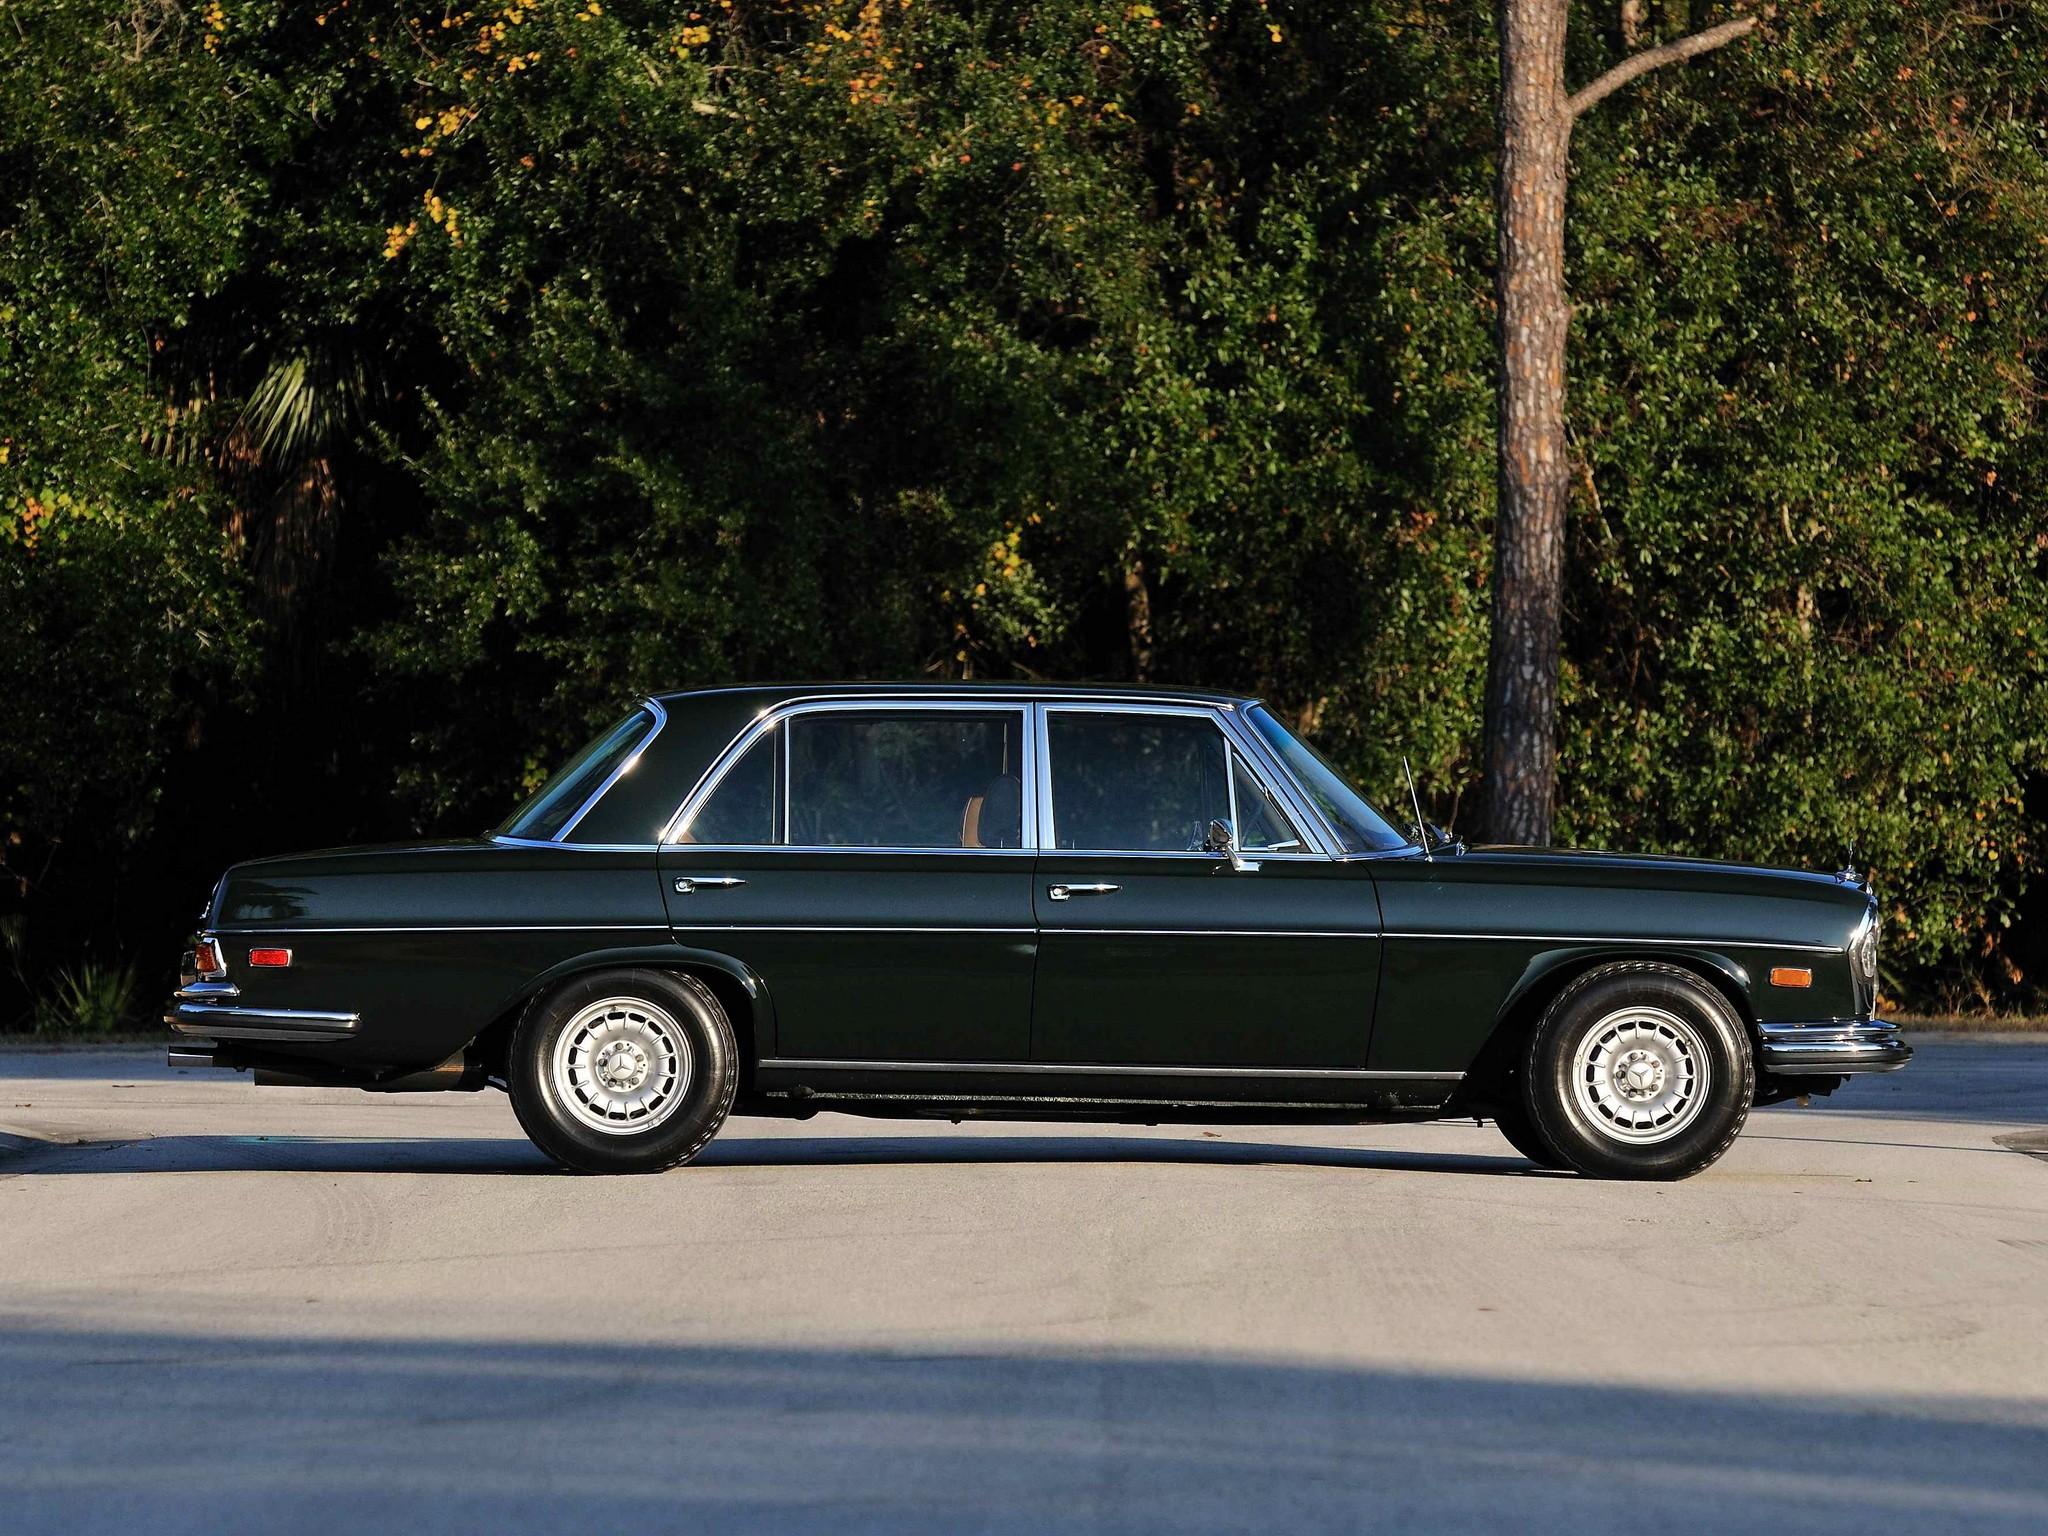 Mercedes benz 300 sel 6 3 w109 specs 1967 1968 1969 for Mercedes benz 300s